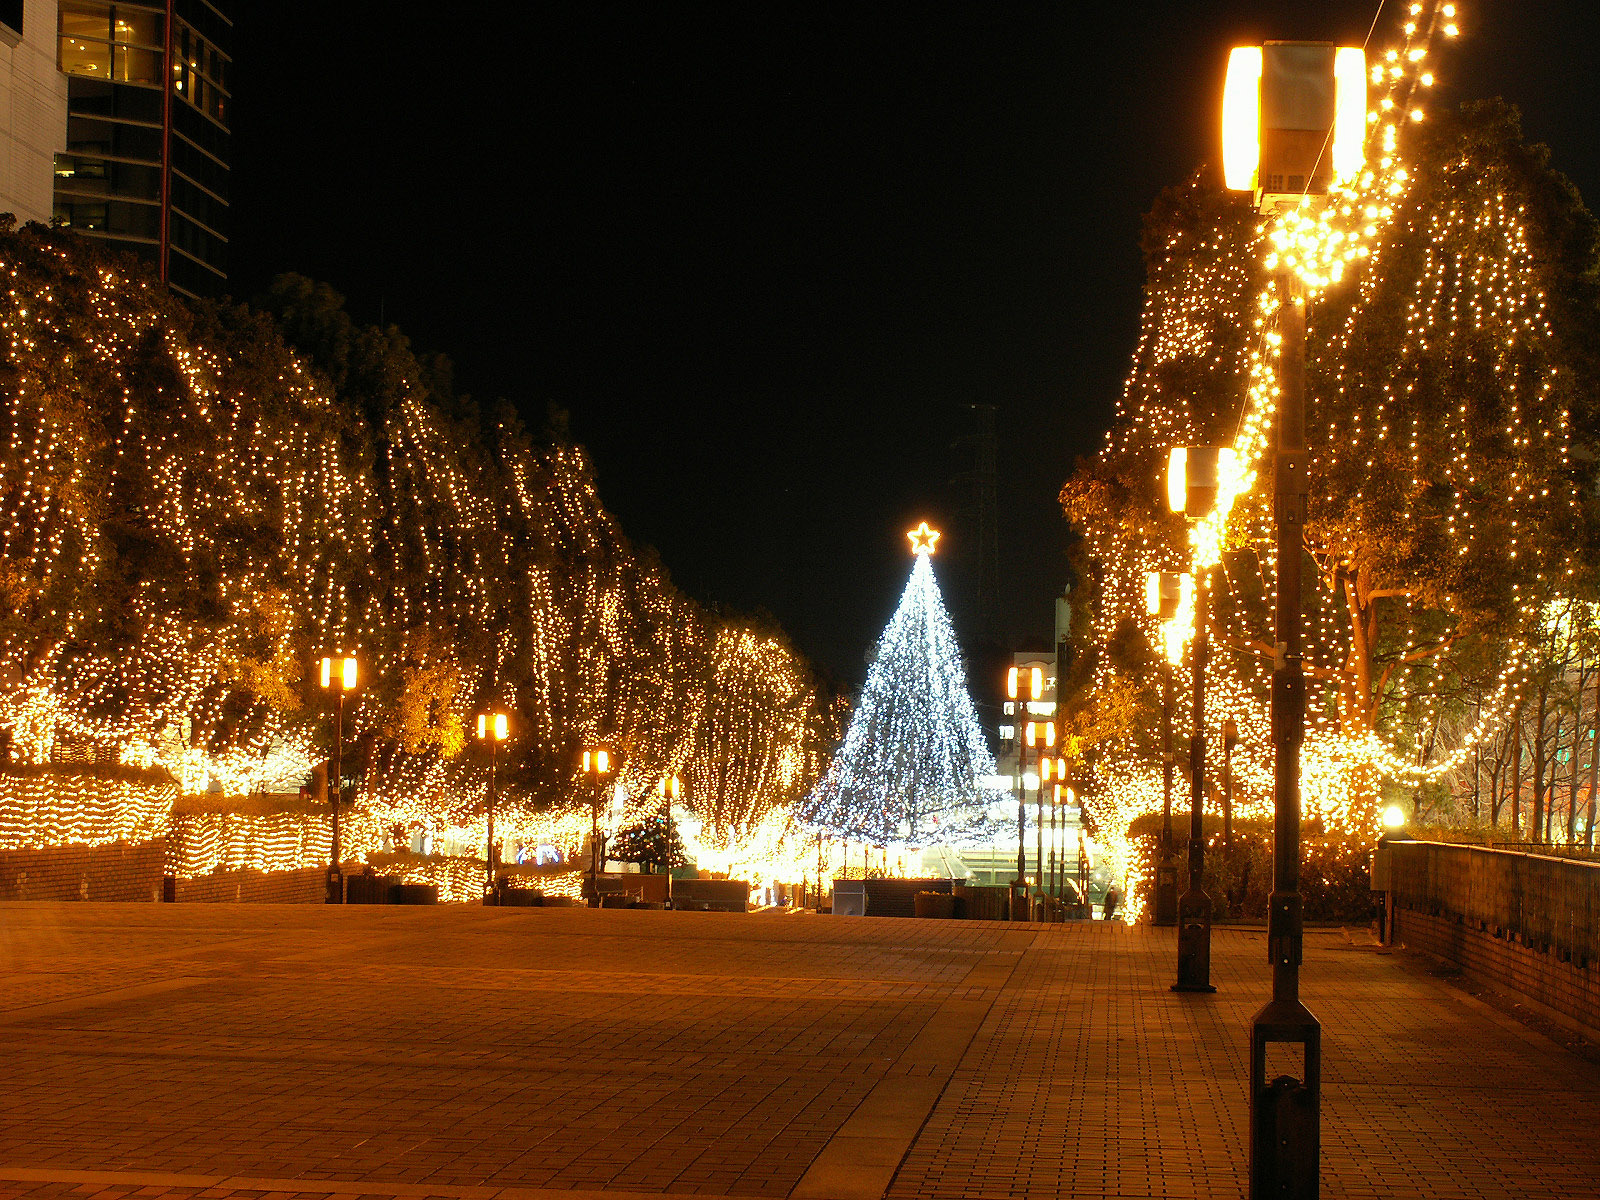 http://1.bp.blogspot.com/-ooGV-zZFvAg/TvWOrMGZSpI/AAAAAAAABSE/uiCYpXEn3No/s1600/wallcoo.com_Christmas_wallpaper_christmas_Night_view_121.jpg